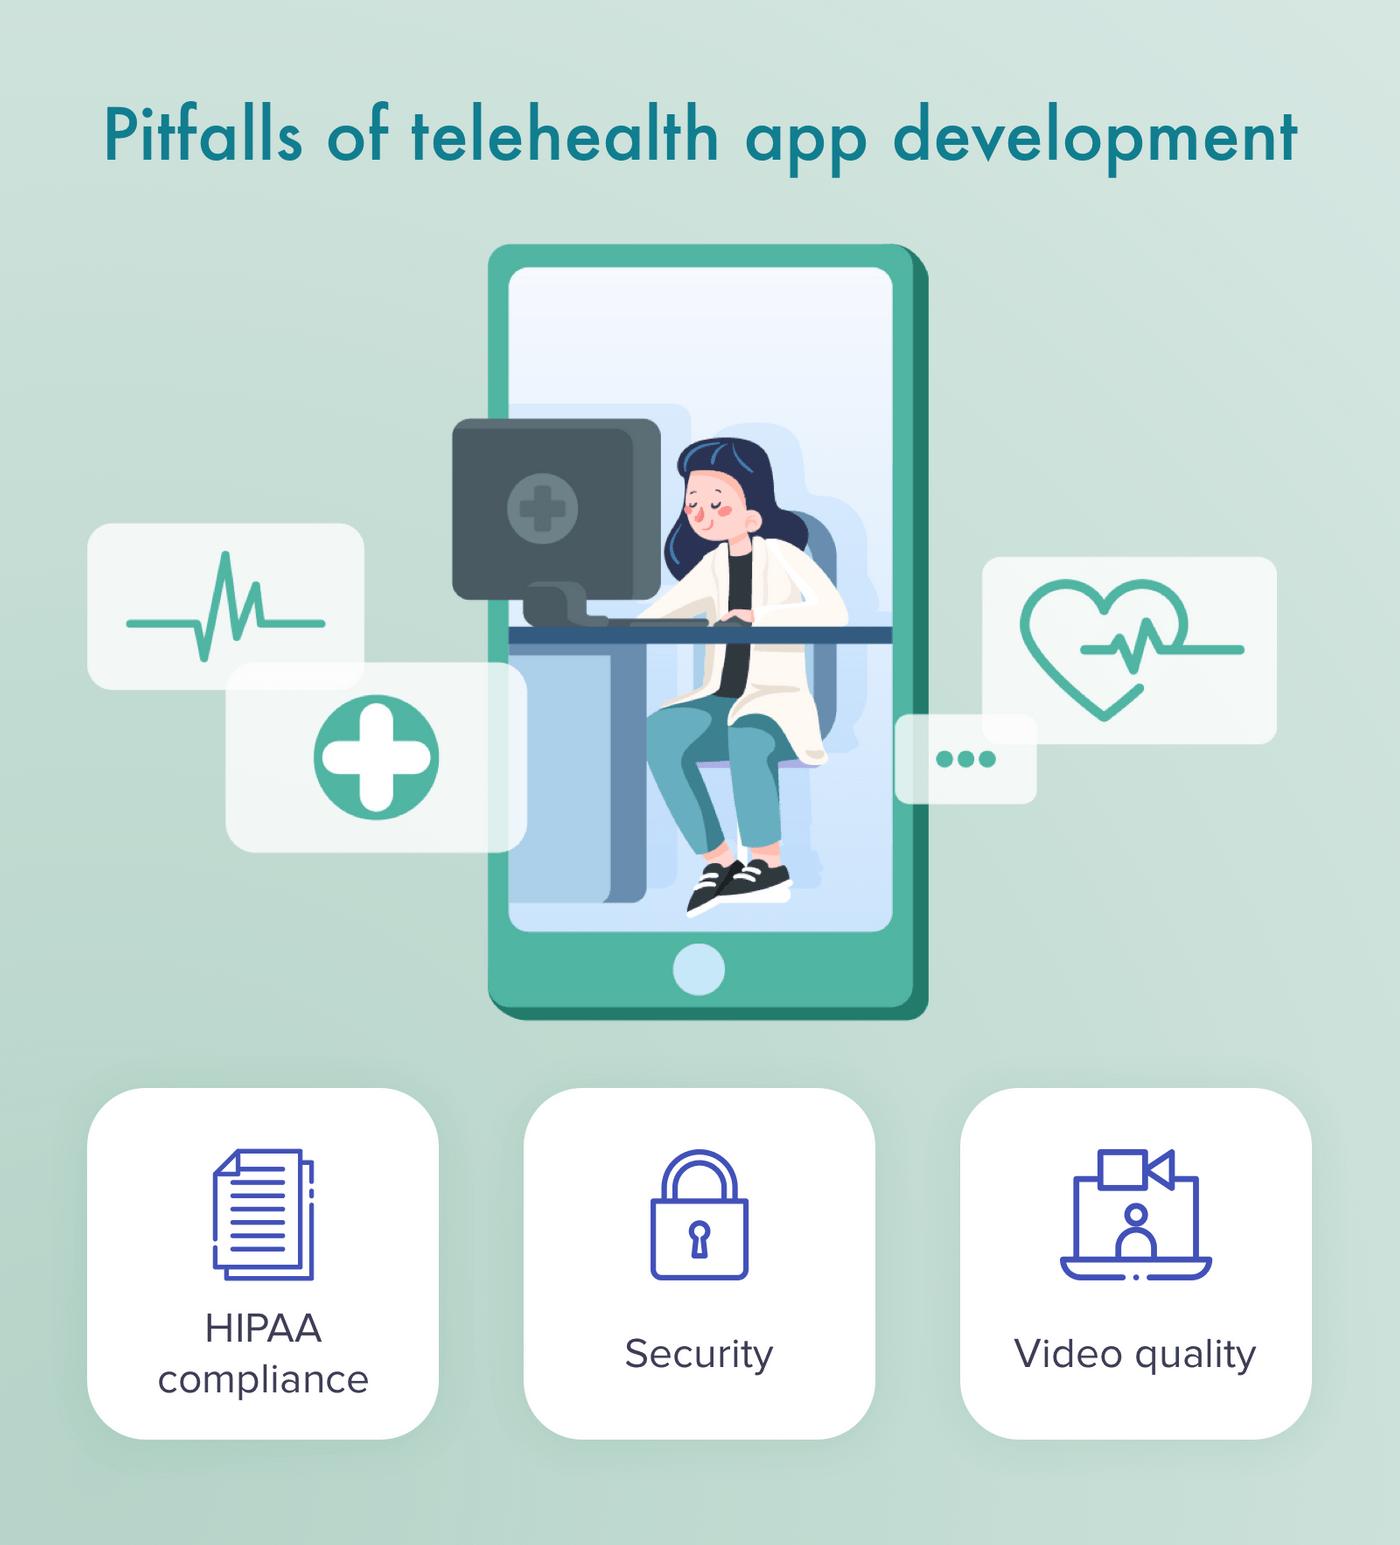 What are the drawbacks of telemedicine app development?